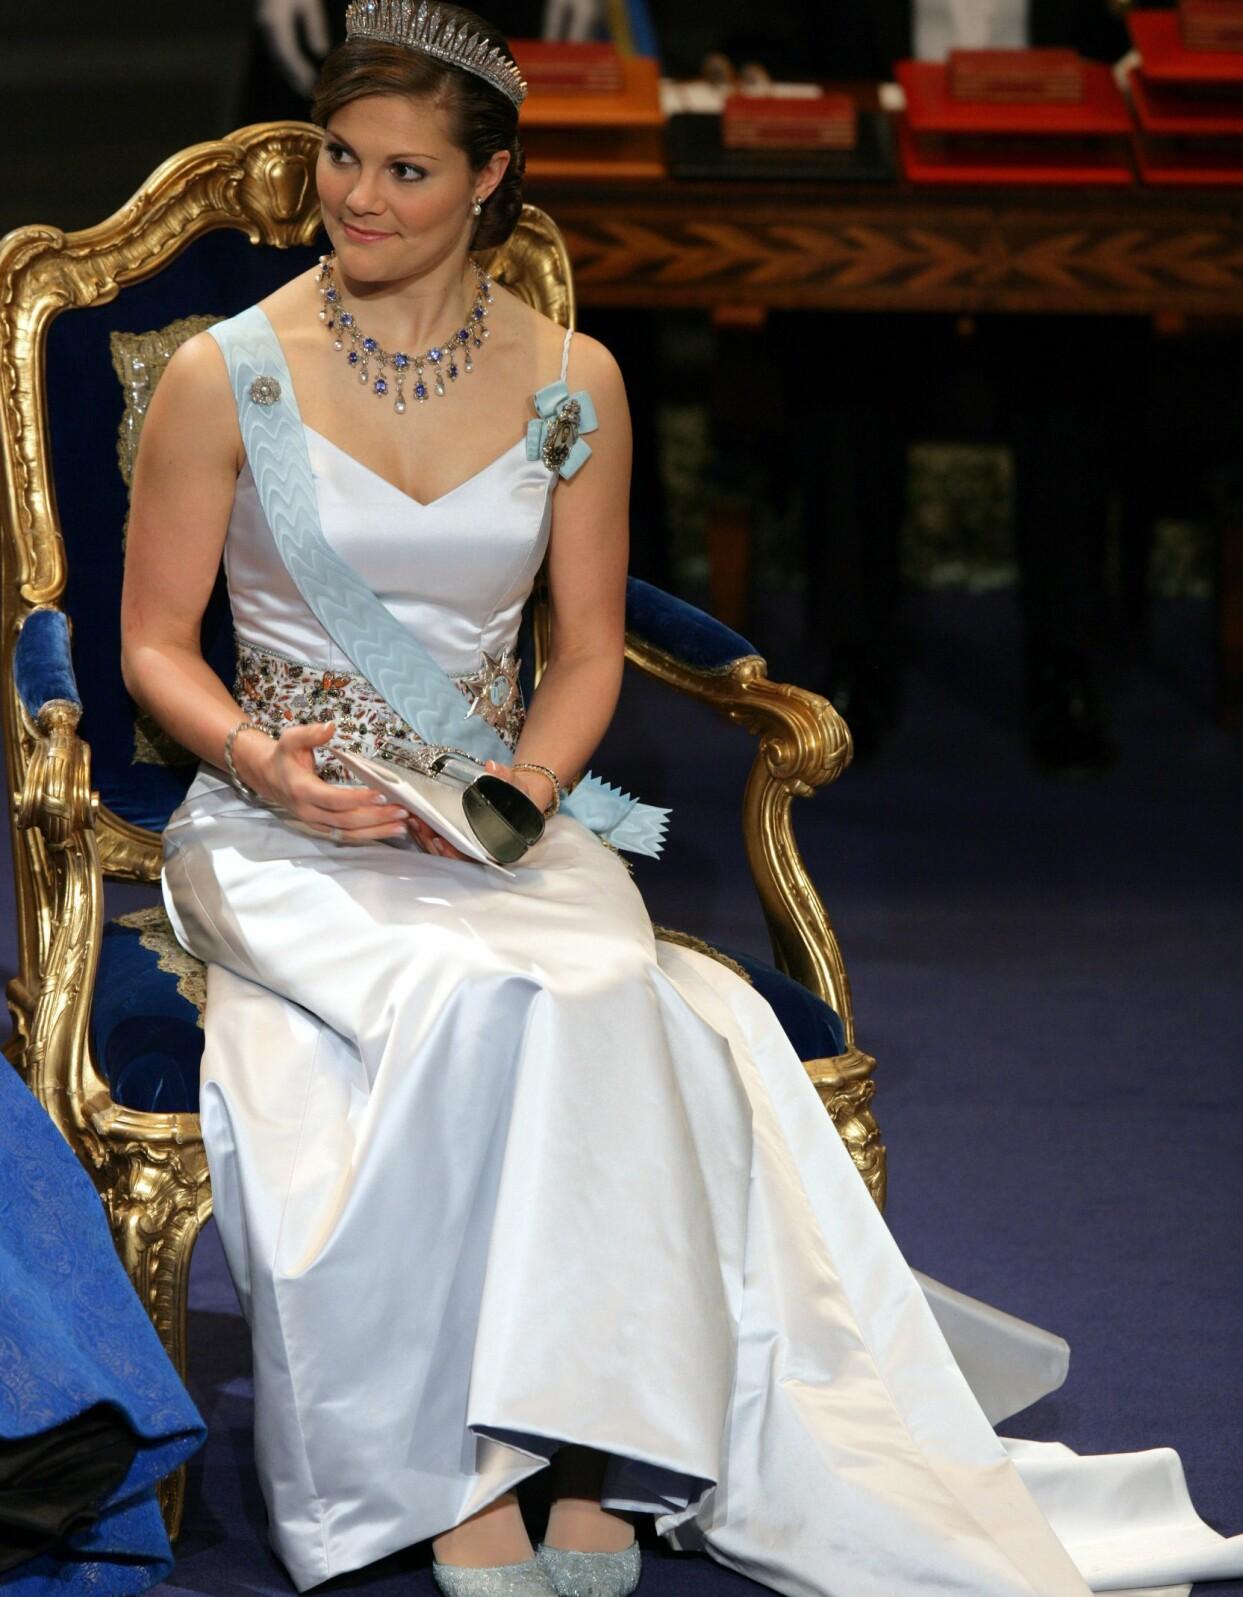 Kronprinsessan Victoria under Nobelprisets utdelning i Stockholm 2005.